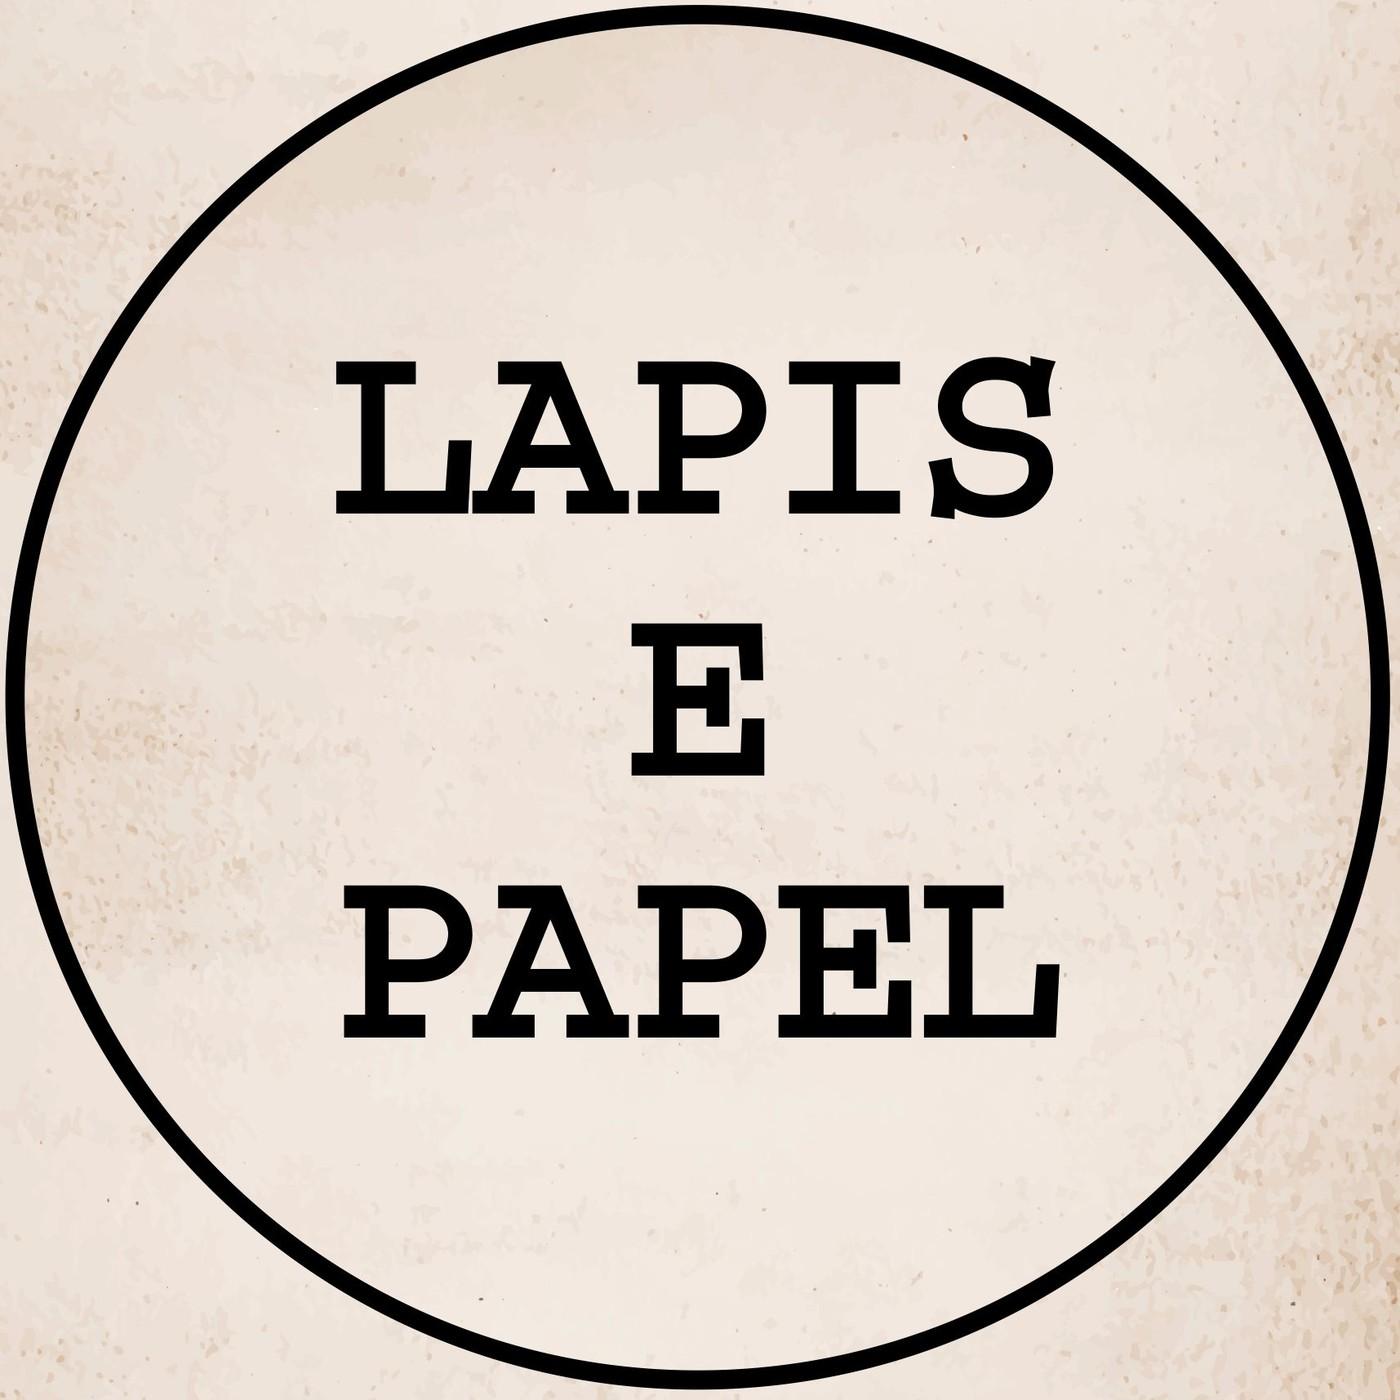 Lapis e papel